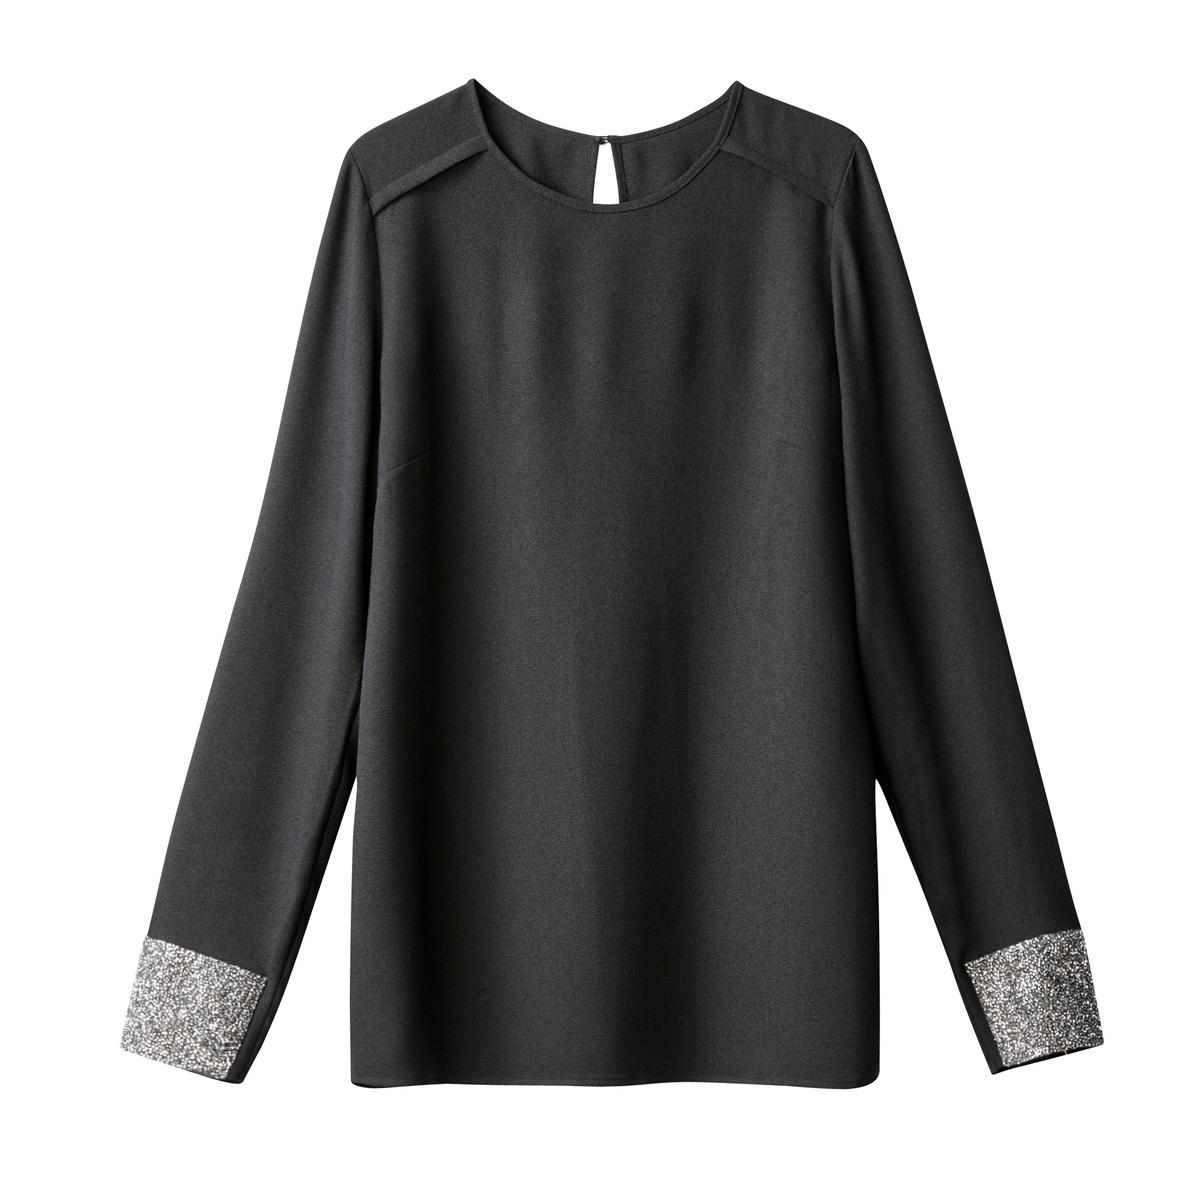 Блузка с длинными рукавами и блестками на манжетах